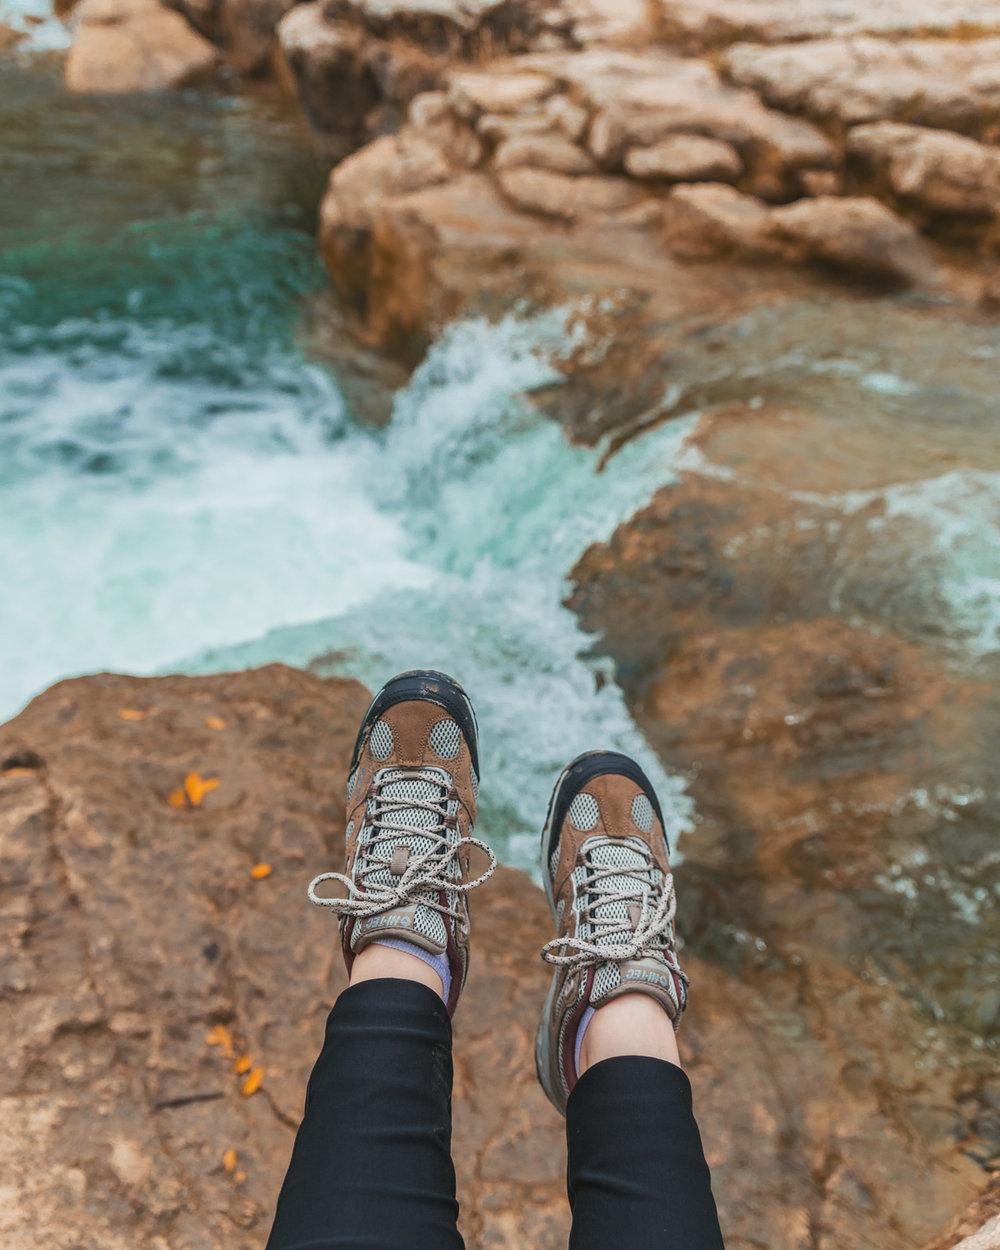 HI-TEC Hiking Boots at Barton Creek Greenbelt // 5 Austin Hiking Trails to Try This Fall #readysetjetset #outdoors #hiking #blogtips #texas #atx